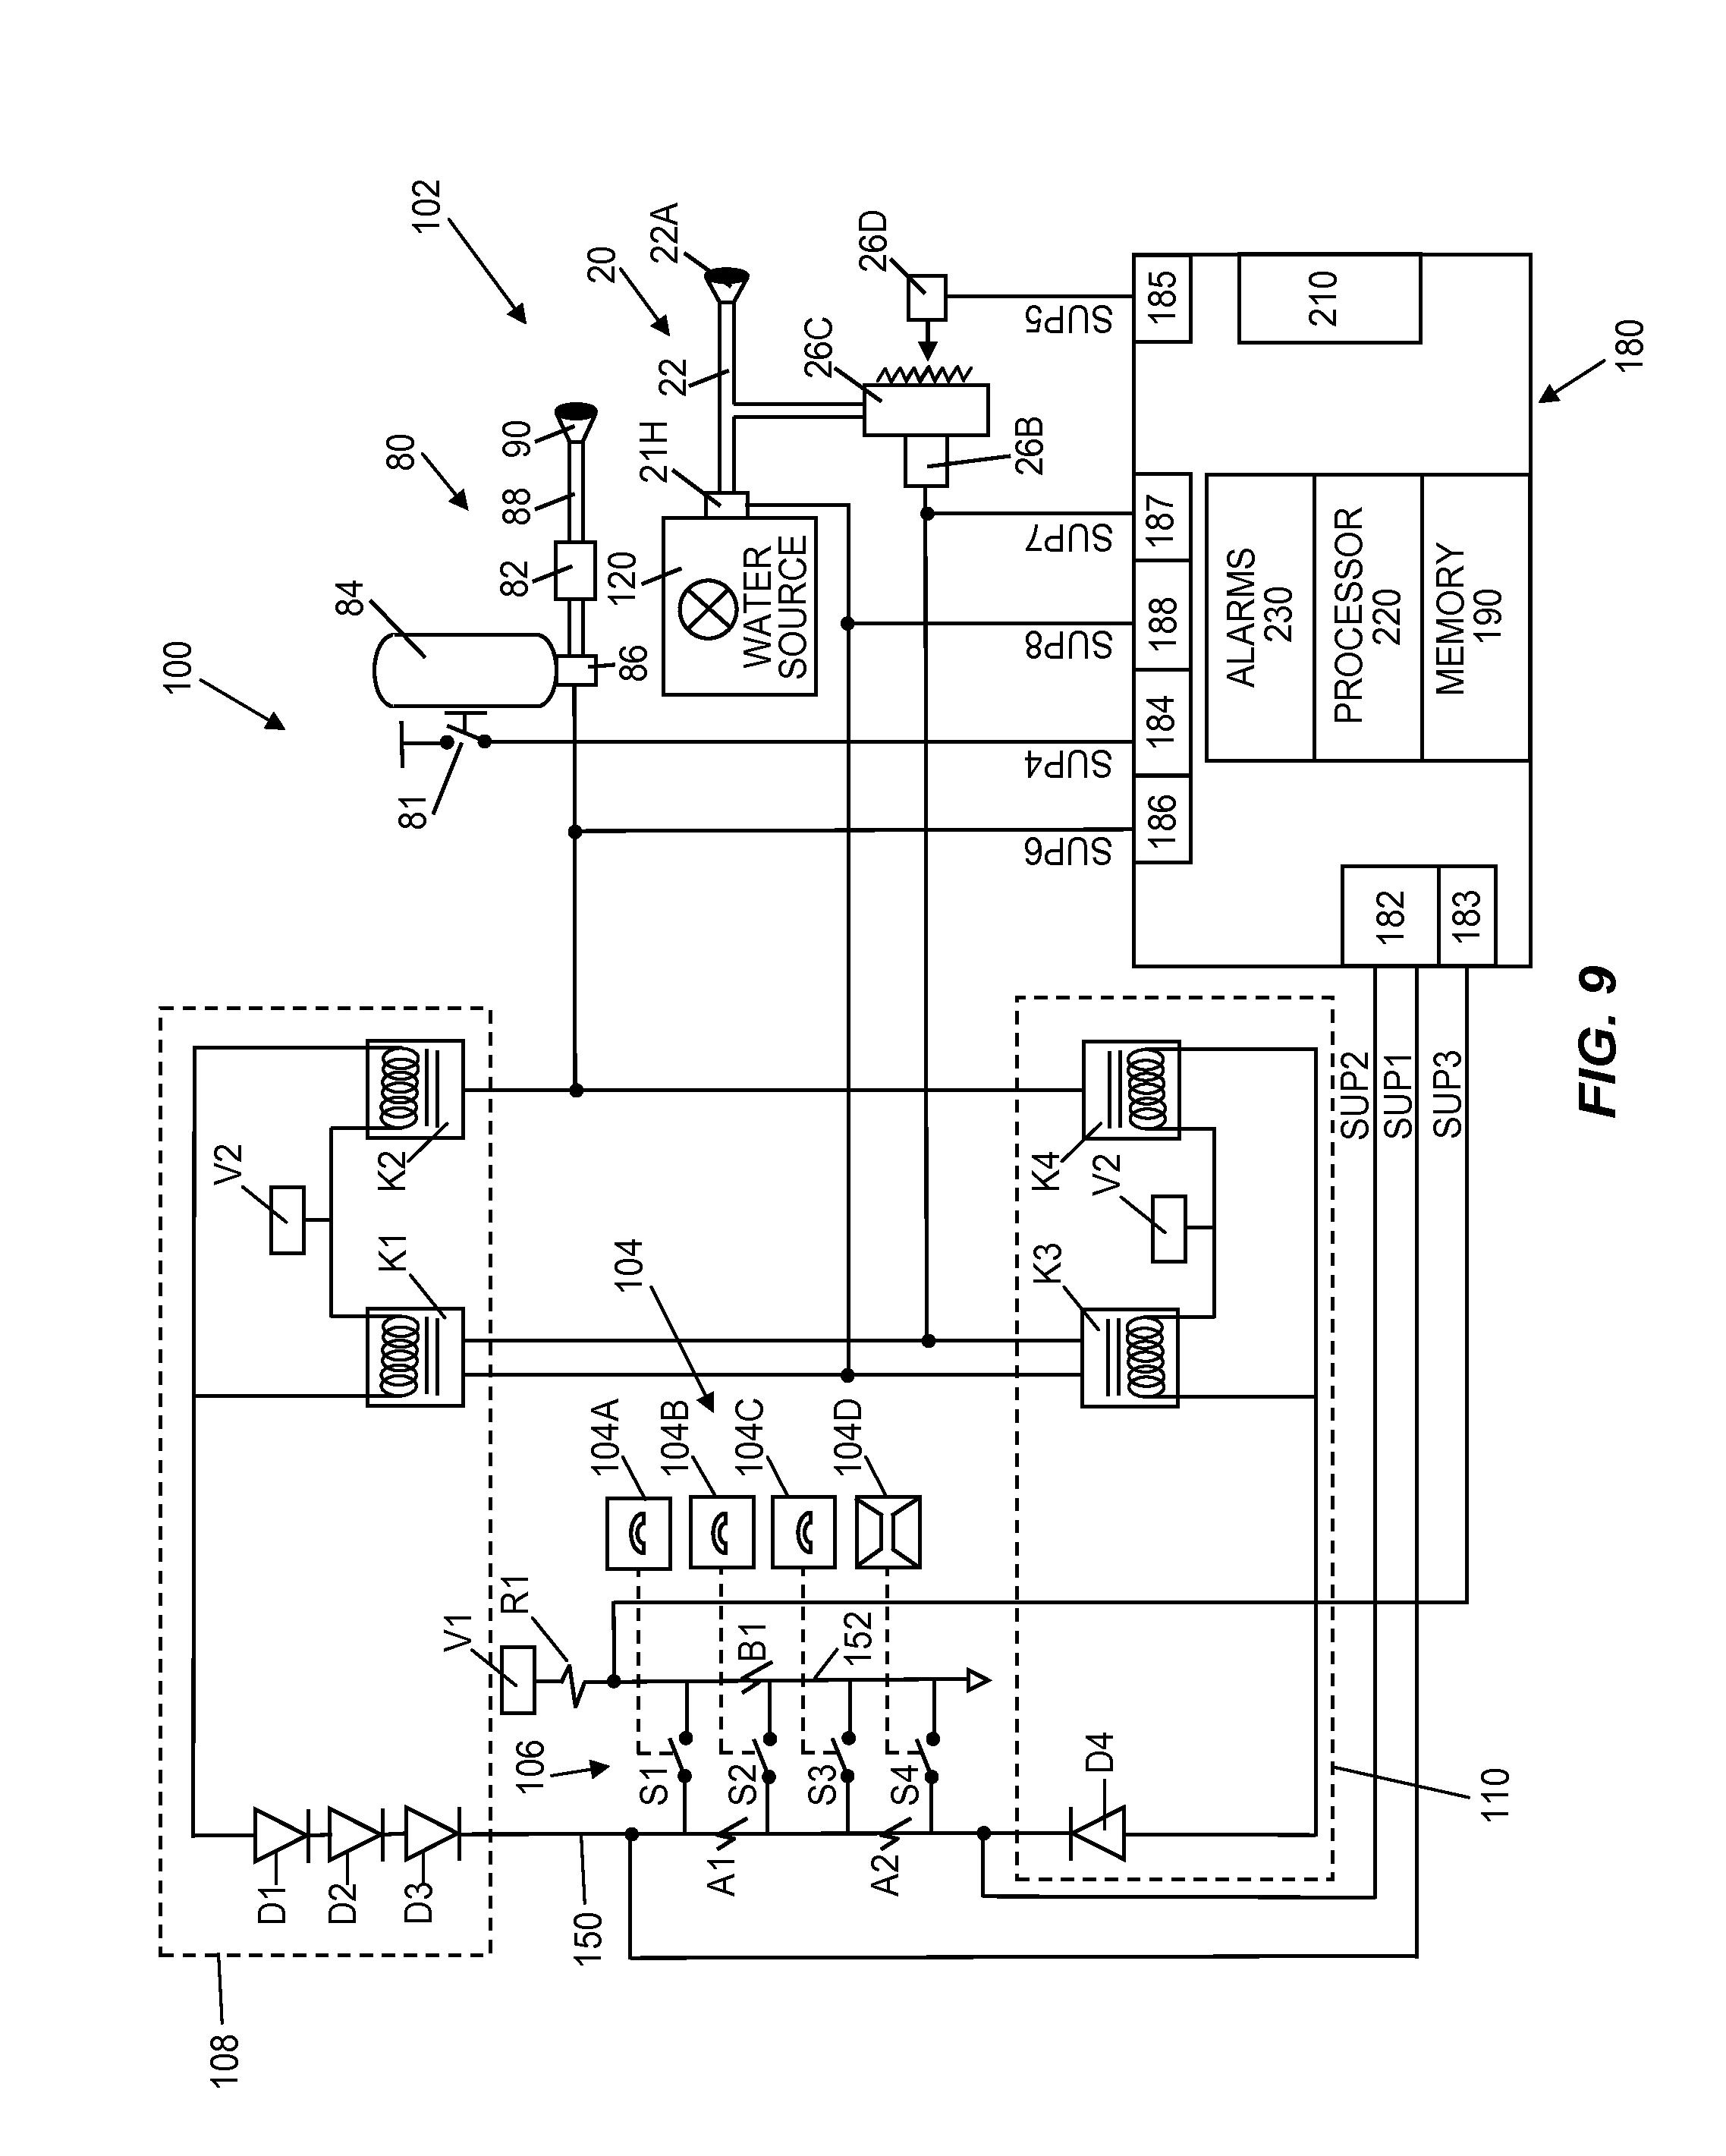 110 Volt Plug Wiring Diagram Photo Album - Wiring diagram schematic